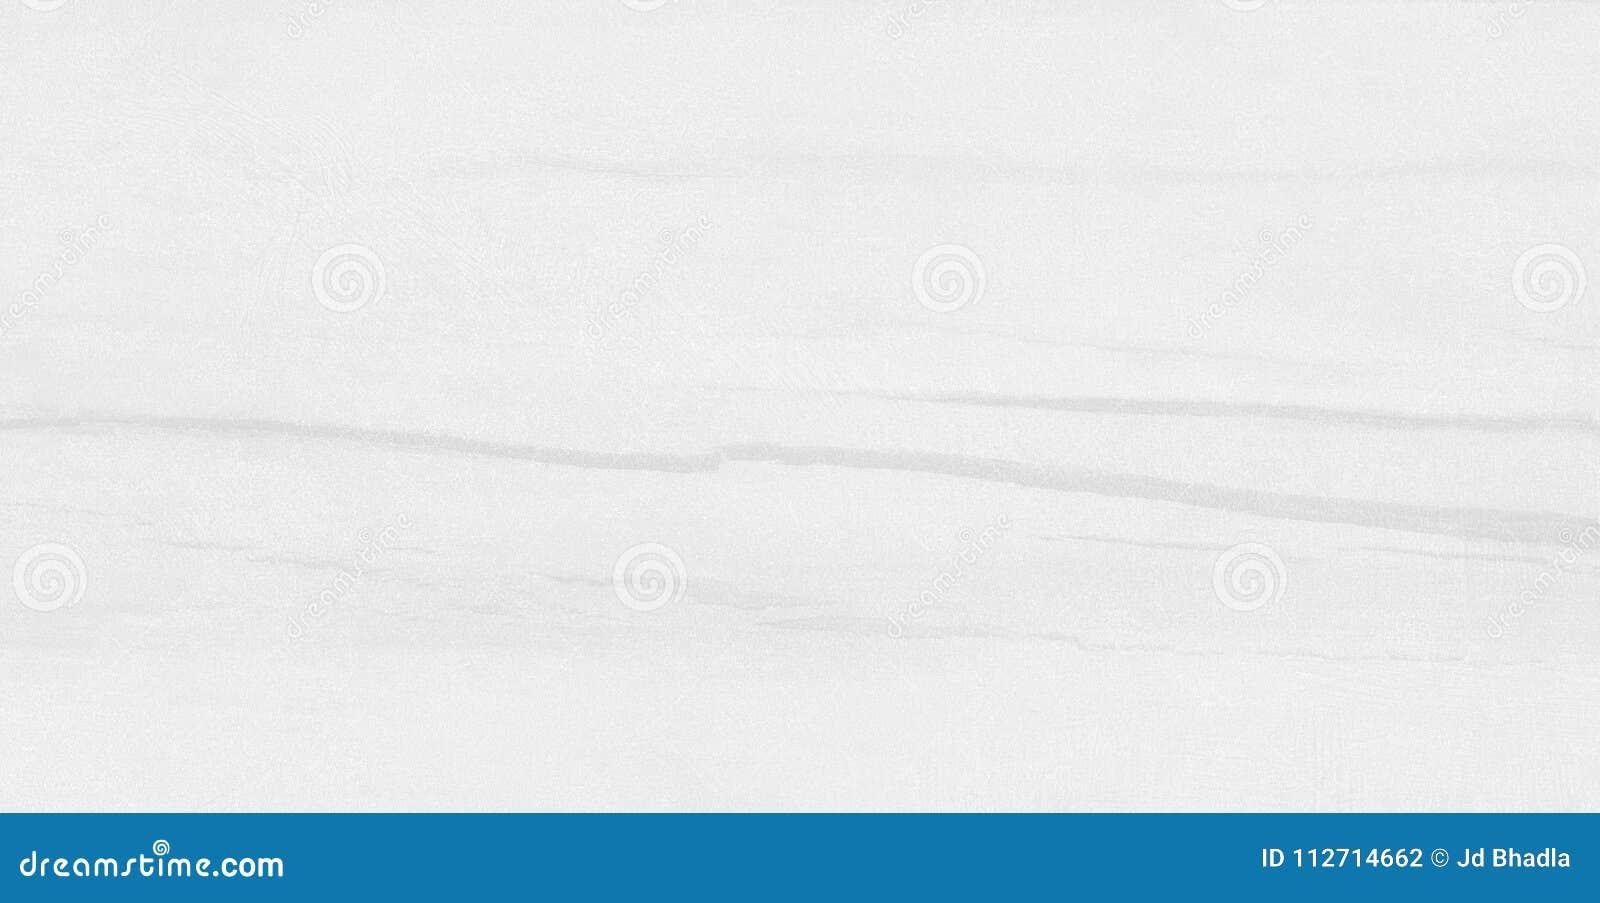 Luxury Gray Stone Marble Texture,Marble Texture